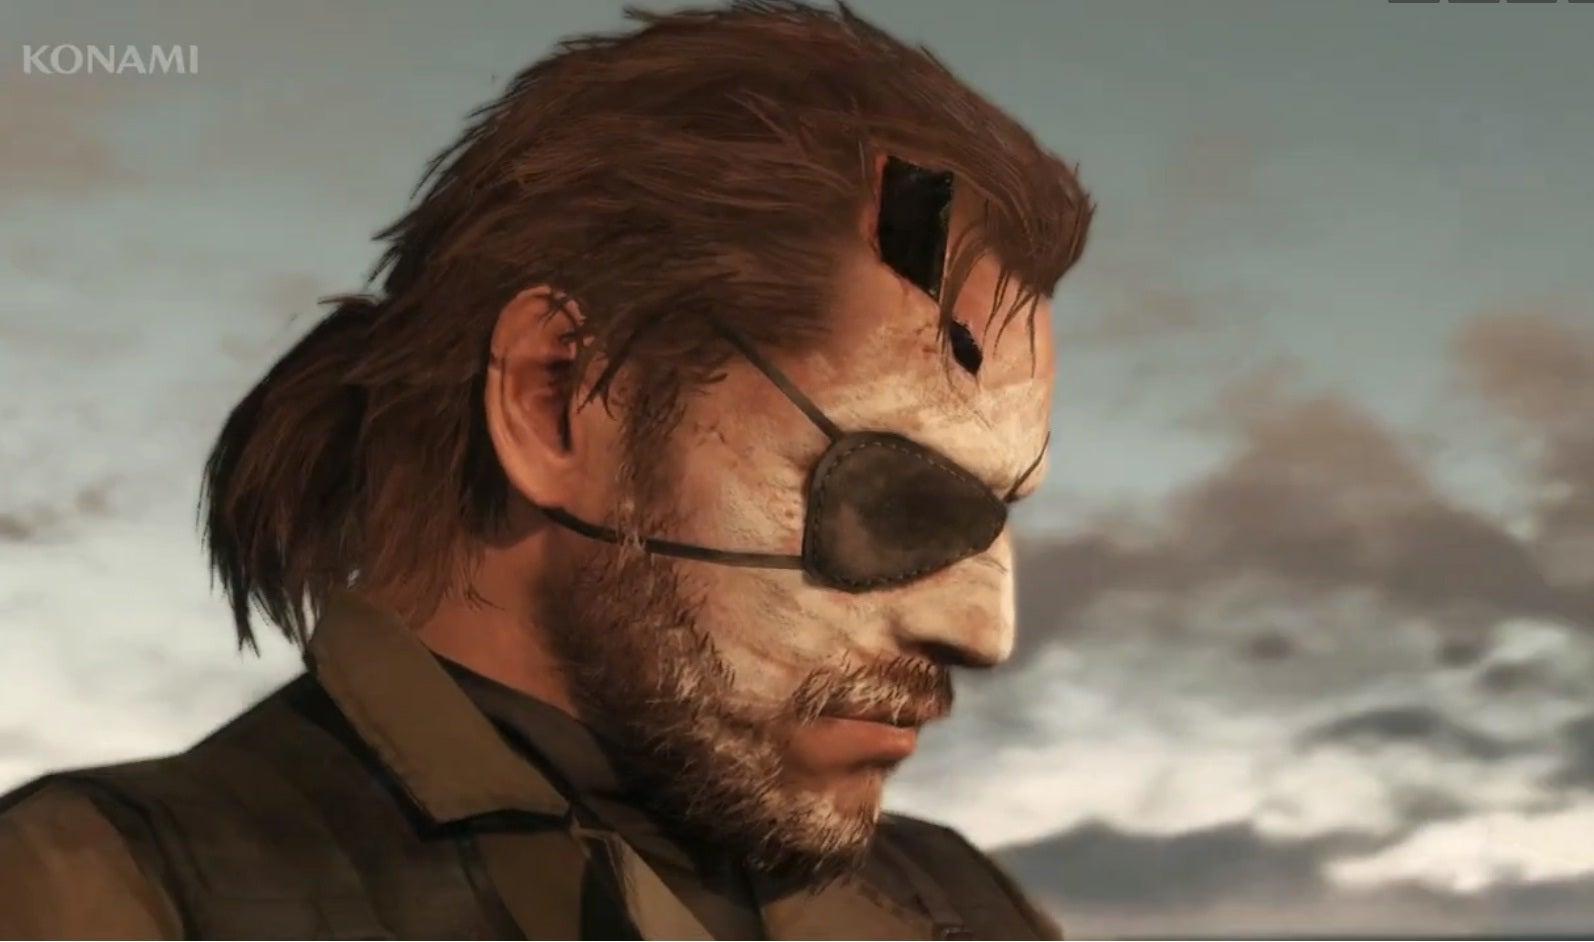 Metal Gear Solid 5: The Phantom Pain trailer leaks ahead of E3   The